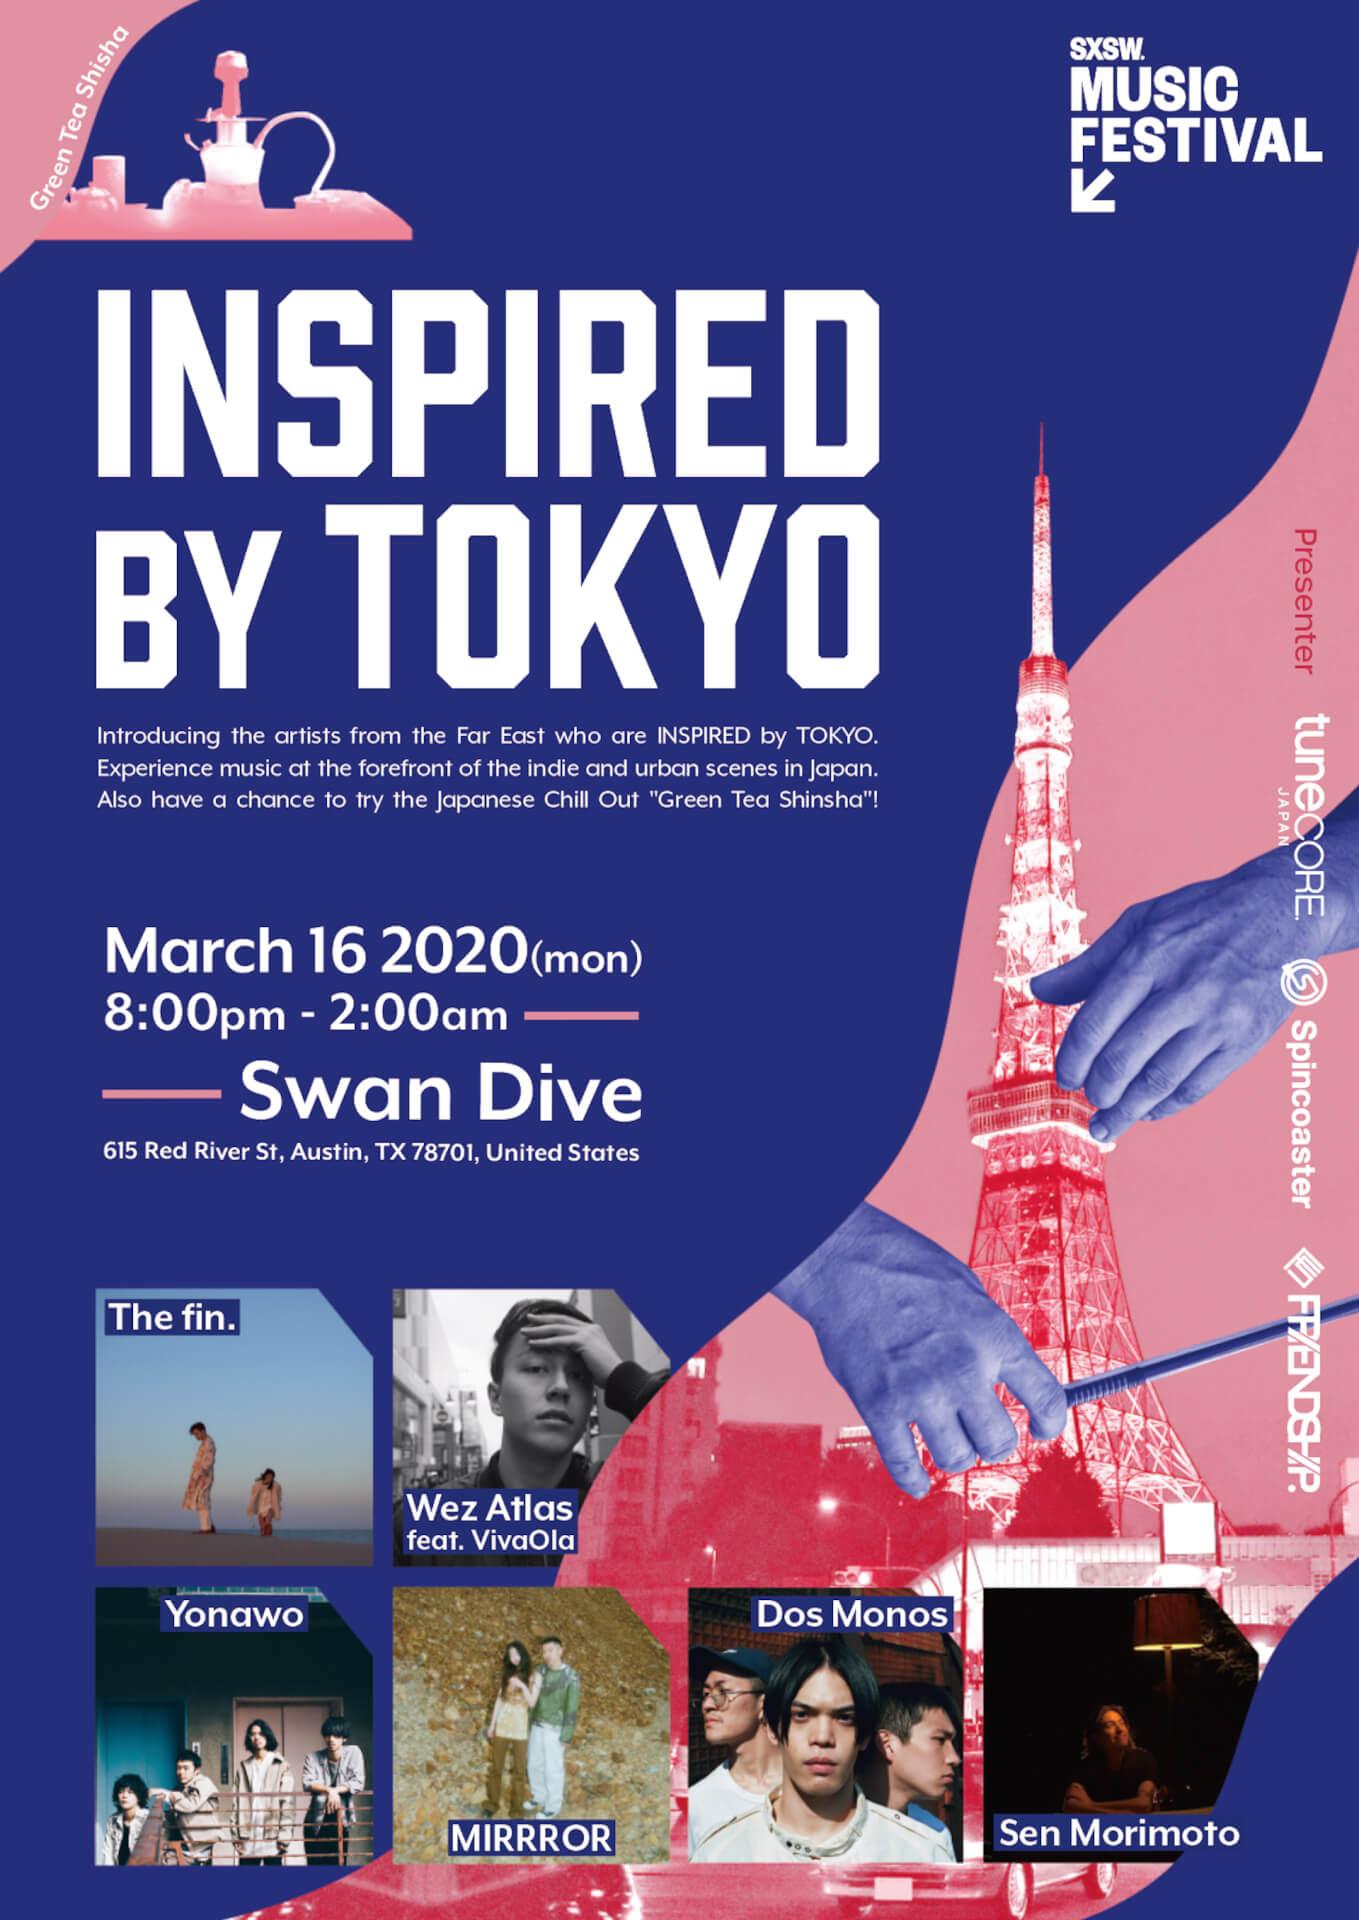 SXSW OFFICIAL SHOWCASE<INSPIRED BY TOKYO>が開催決定!The fin.、Dos Monosらが集結 music200219_inspiredbytokyo_08